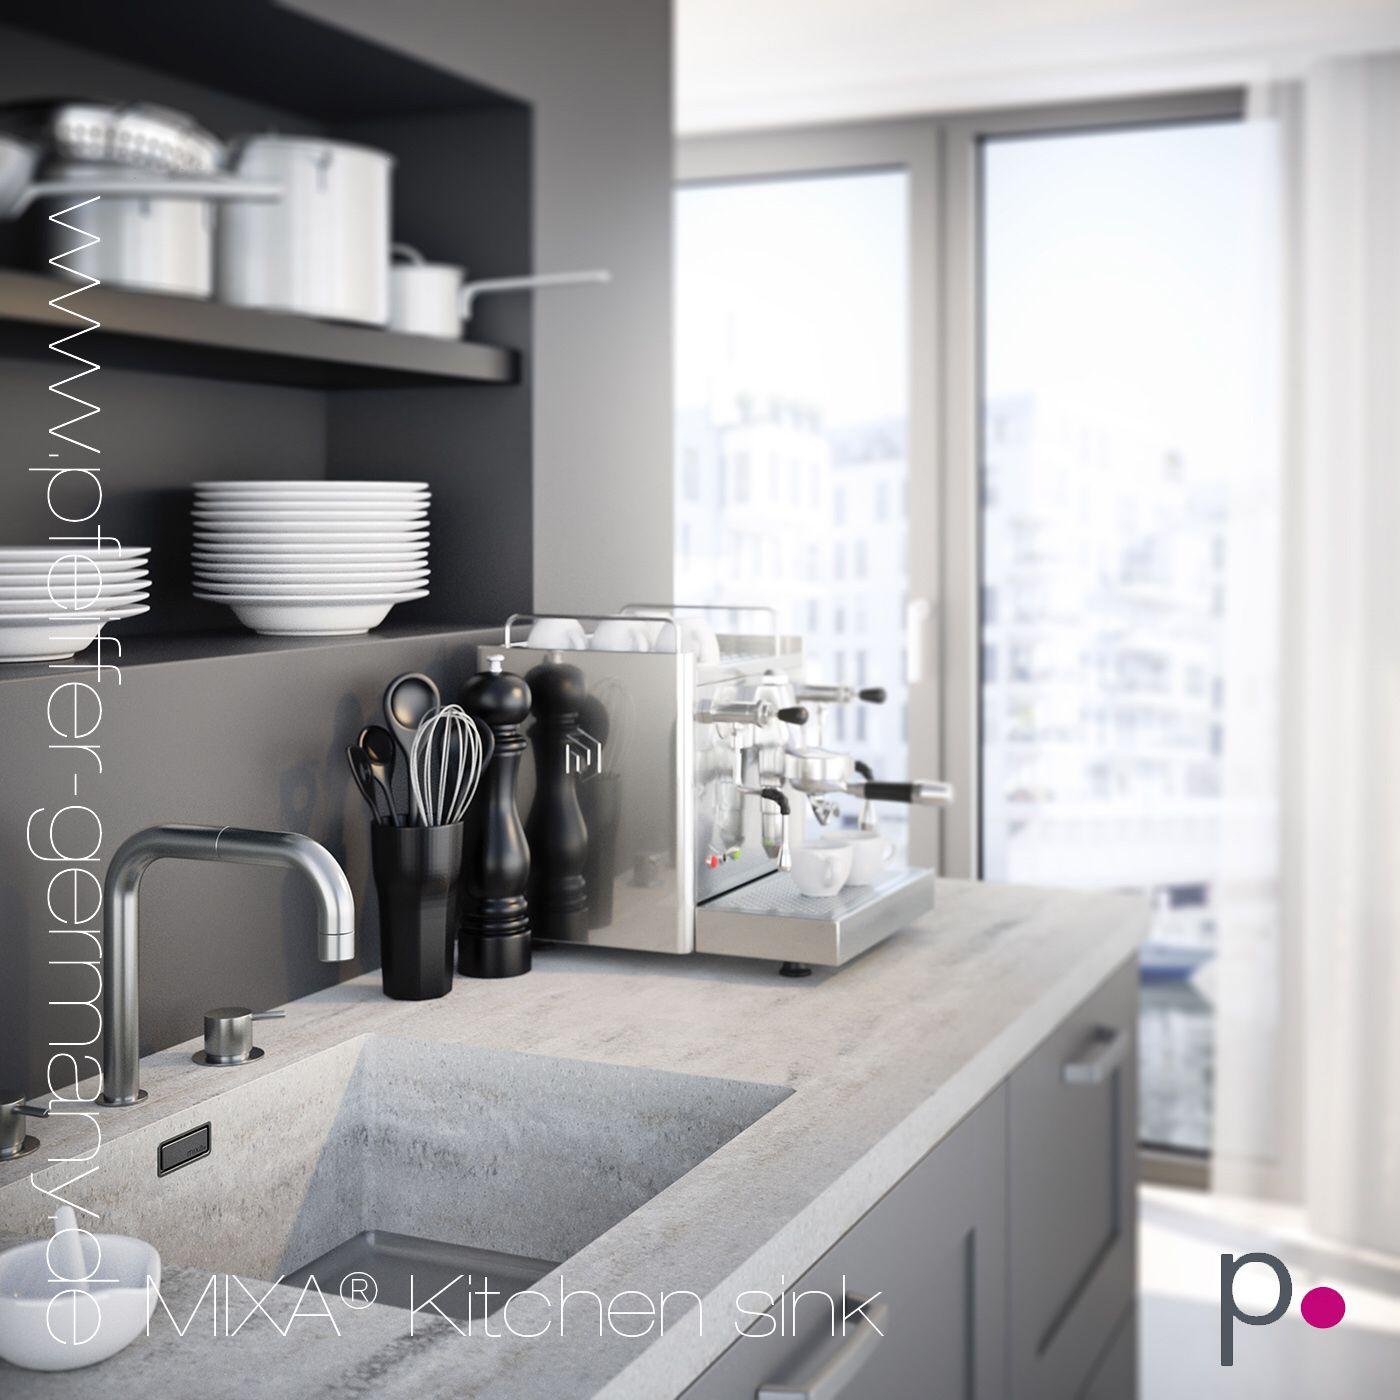 Feel Free For Shapes Sizes And Colours Of Solid Surface Material Design Your Kitchen Worktop With A Mixa Kitchen Sink Mit Bildern Waschbecken Kuche Entwerfen Kuchenspule